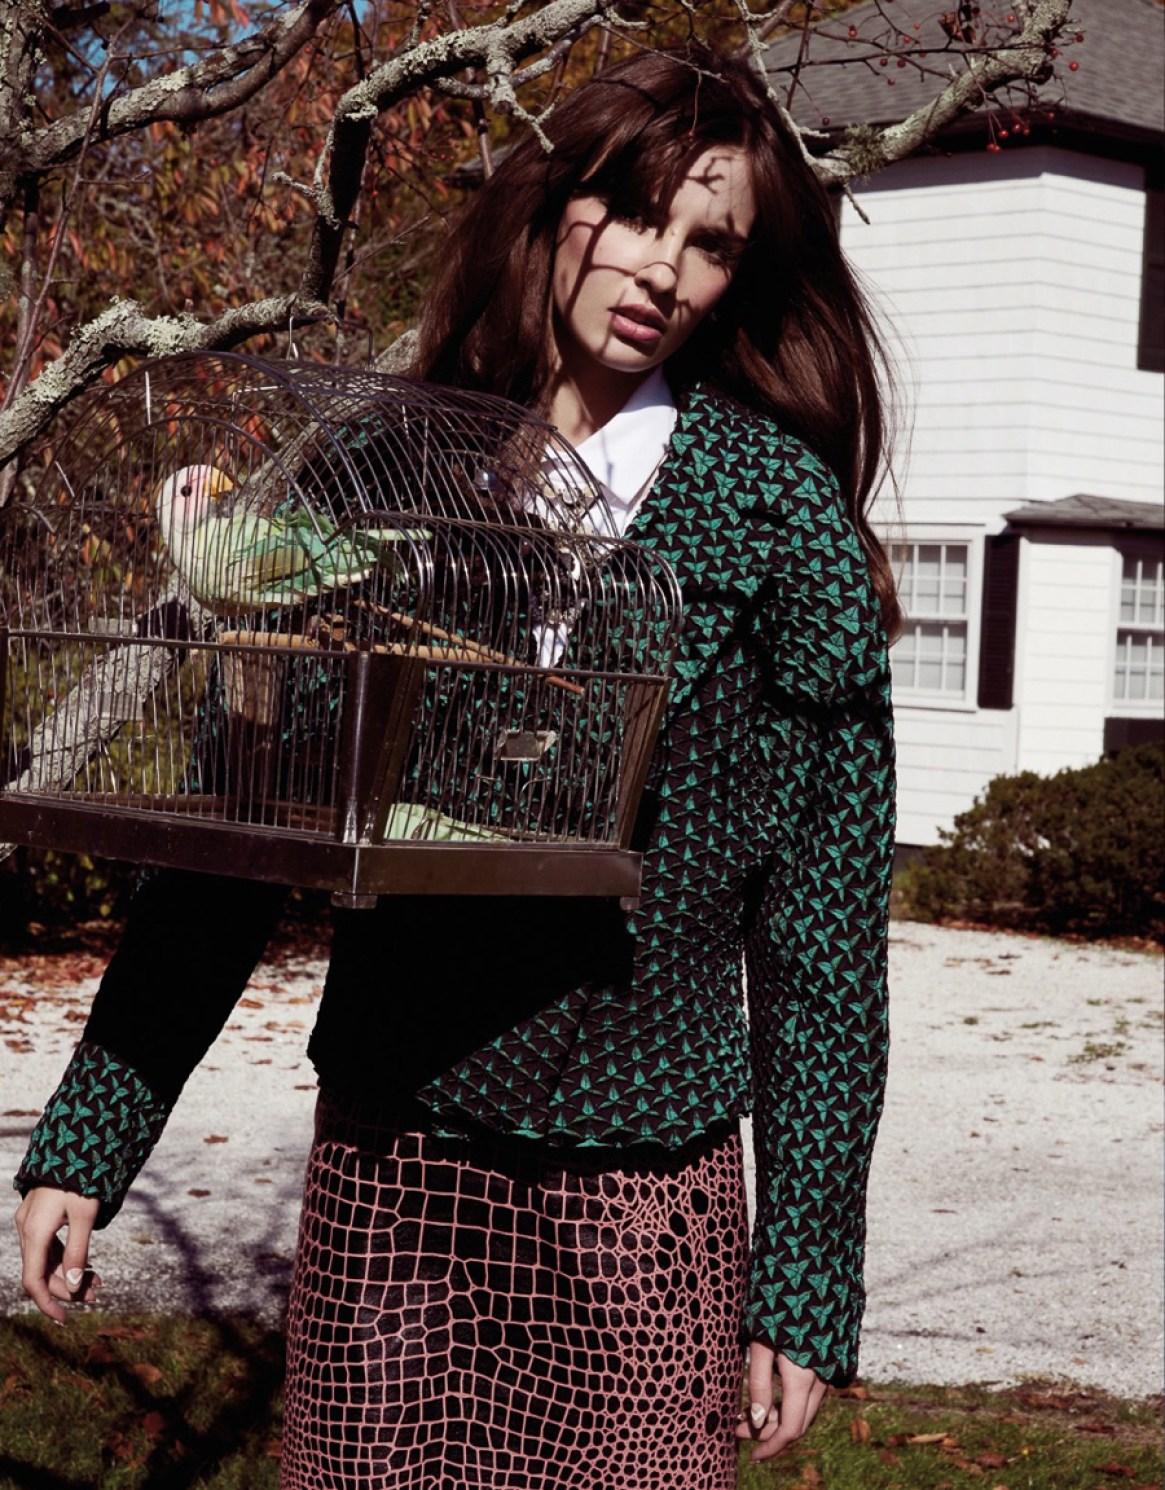 Yulia Erkamova -Yulia-Erkamova-by-Jamie-Nelson-2016_amie-nelson-editorial-photography_best-vogue-editorials-2016_Yulia-Erkamova-editorials_Yulia-Erkamova-personal-style_Ezter-Boldov-fashion-style_Nika-Lauratis-editorials_vogue-taiwan-editorials-2016_top-editorial-bloggers-australia-uk-africa-2016_best-british-fashion-blogs-2016